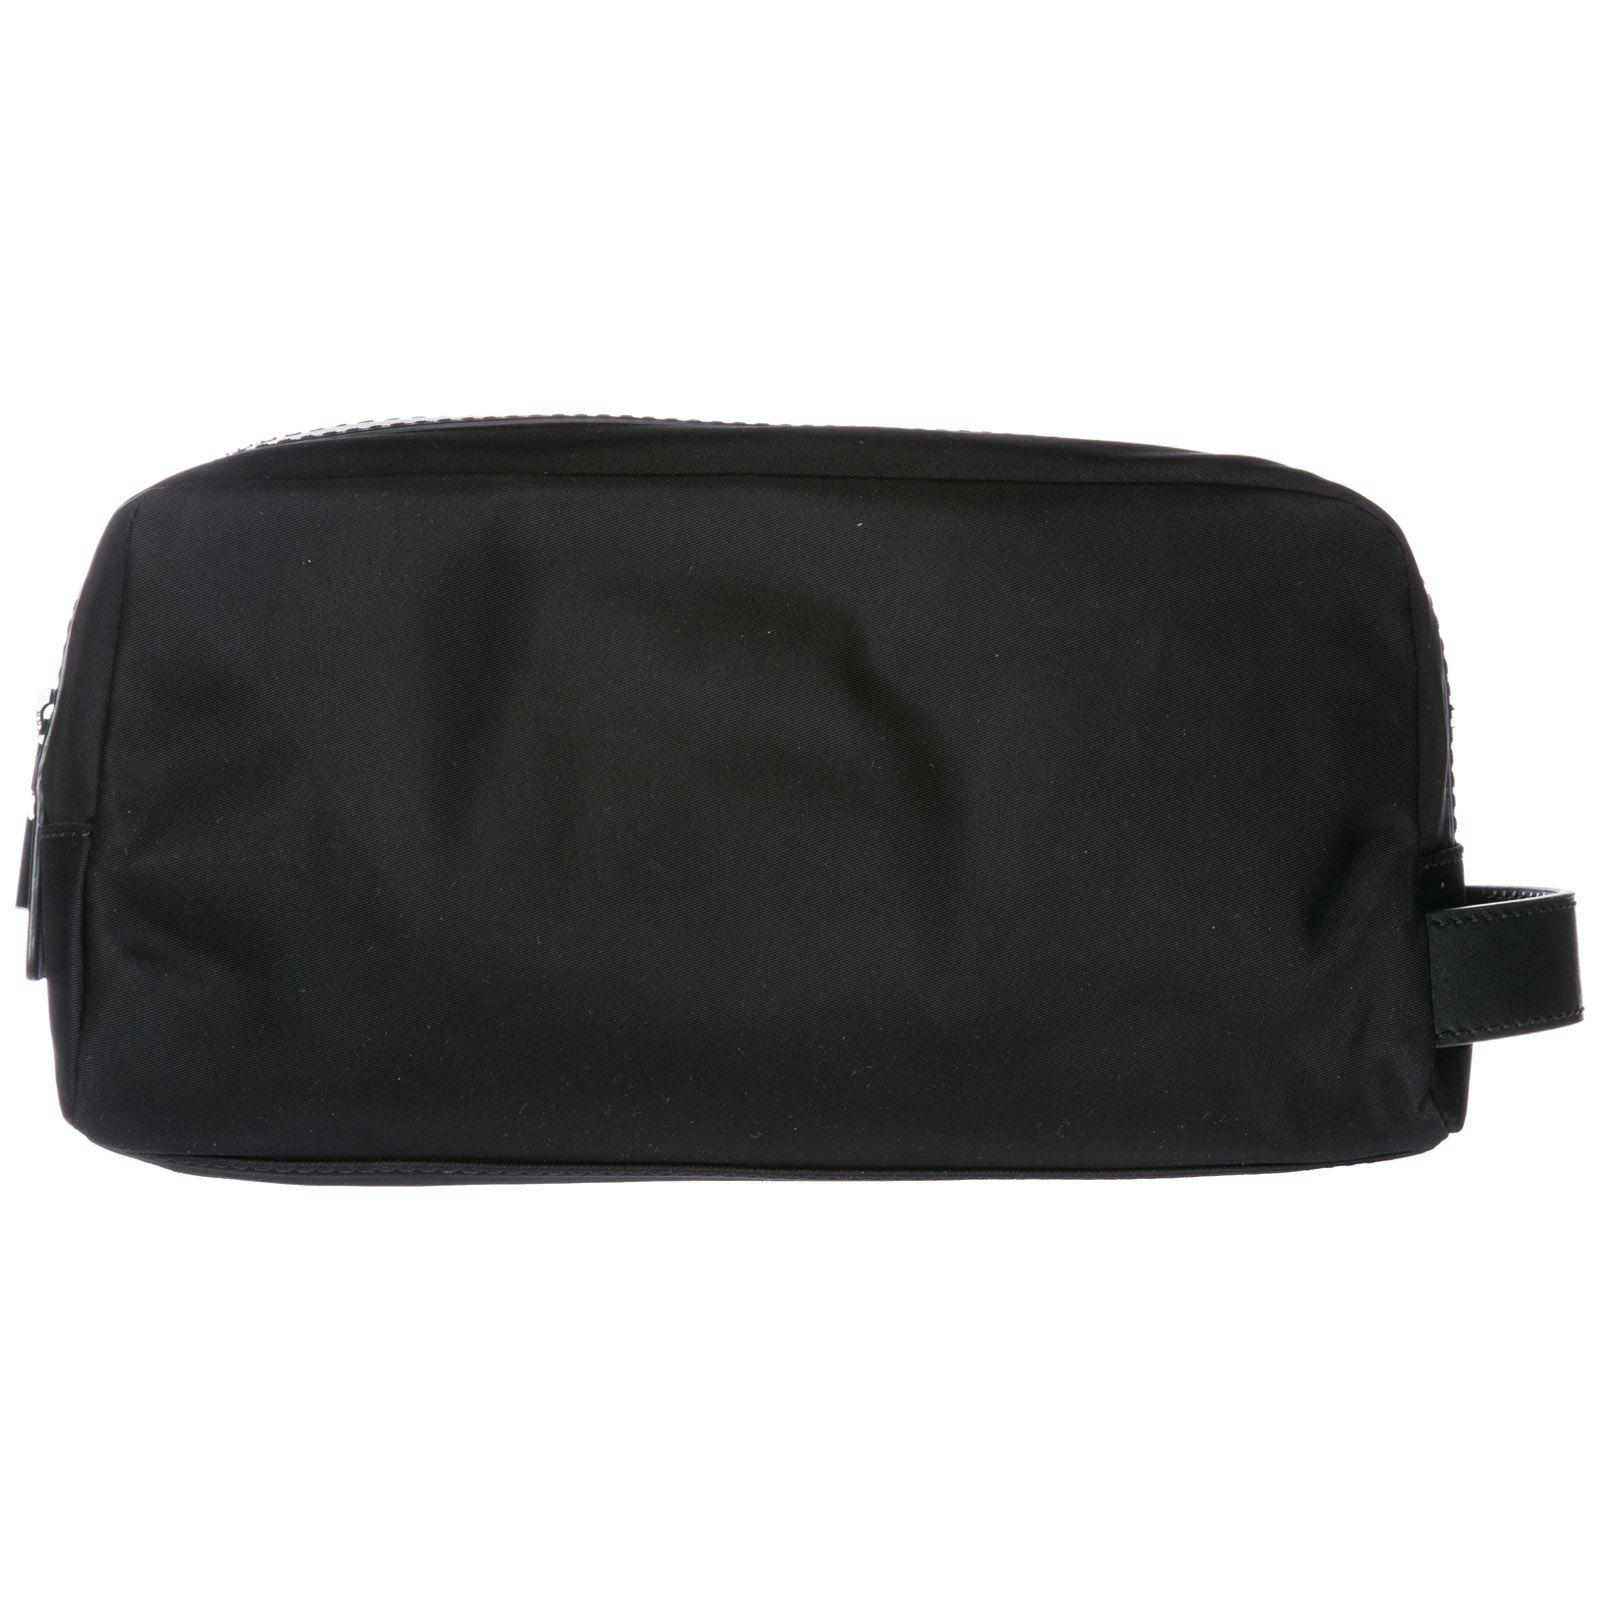 Michael Kors Cases Michael Kors  Travel Toiletries Beauty Case Wash Bag In Nylon Kent